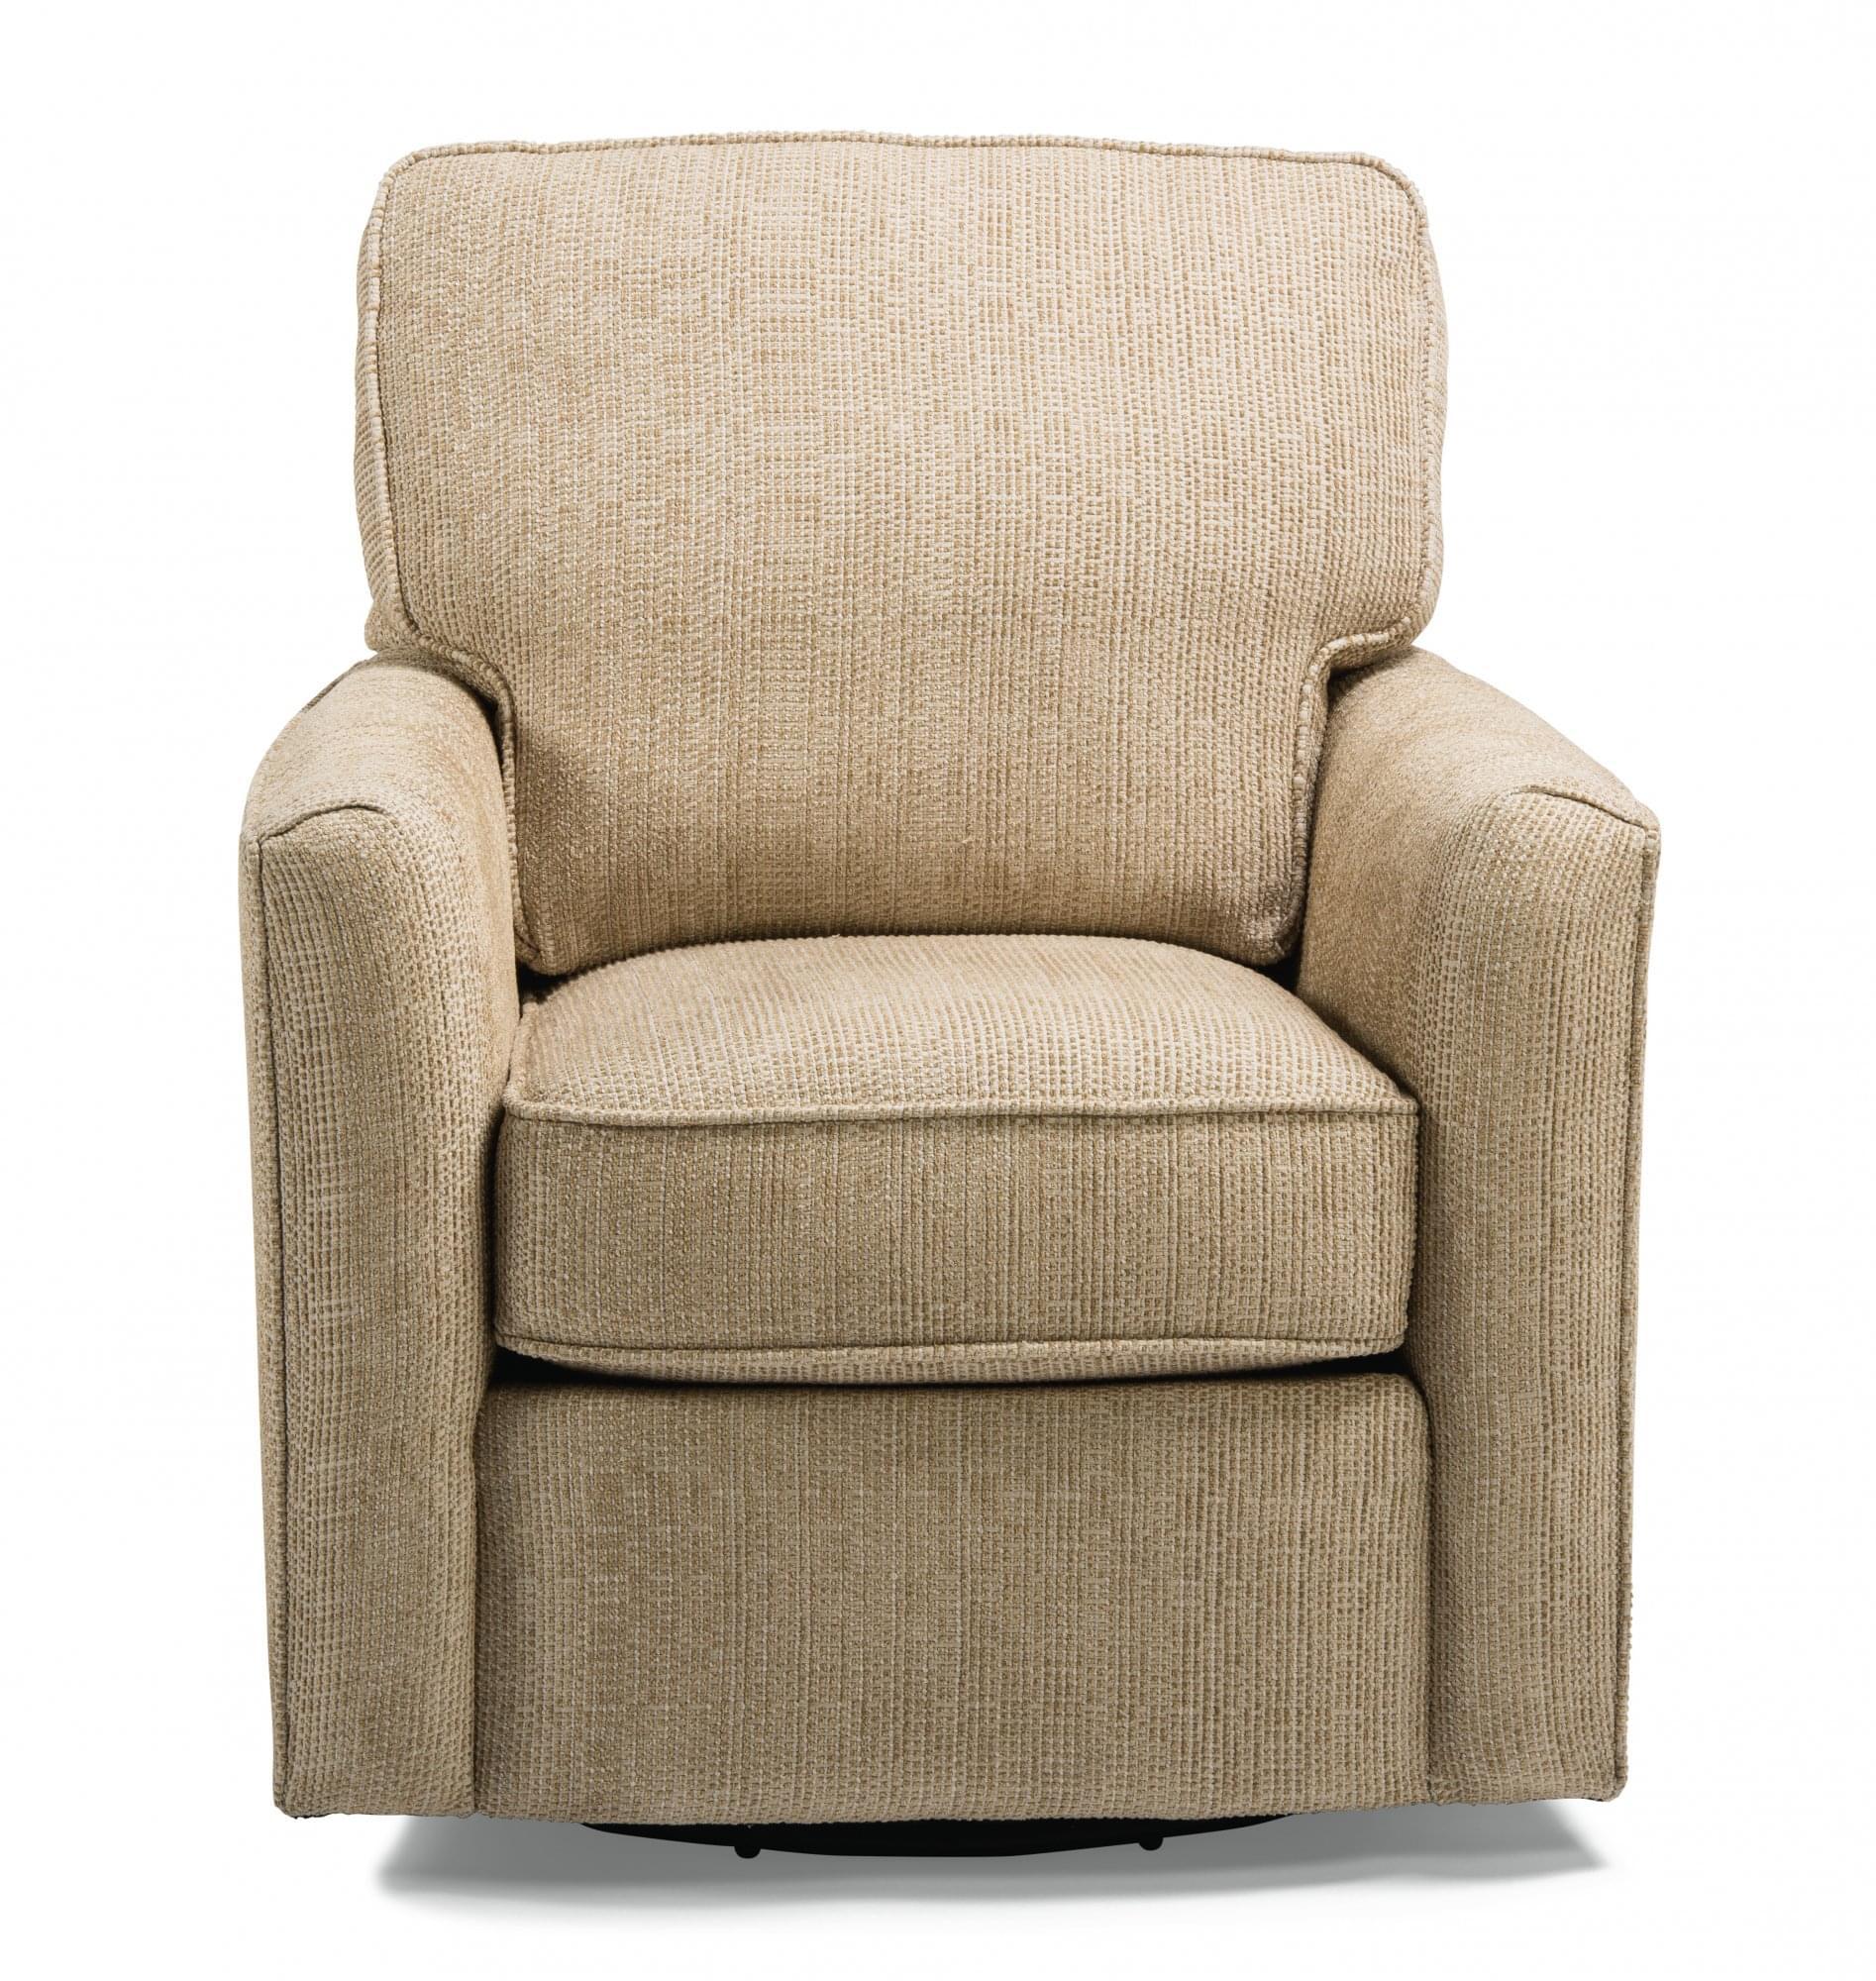 Flexsteel Chamberlain Chair at Mums Place Furniture Monterey CA